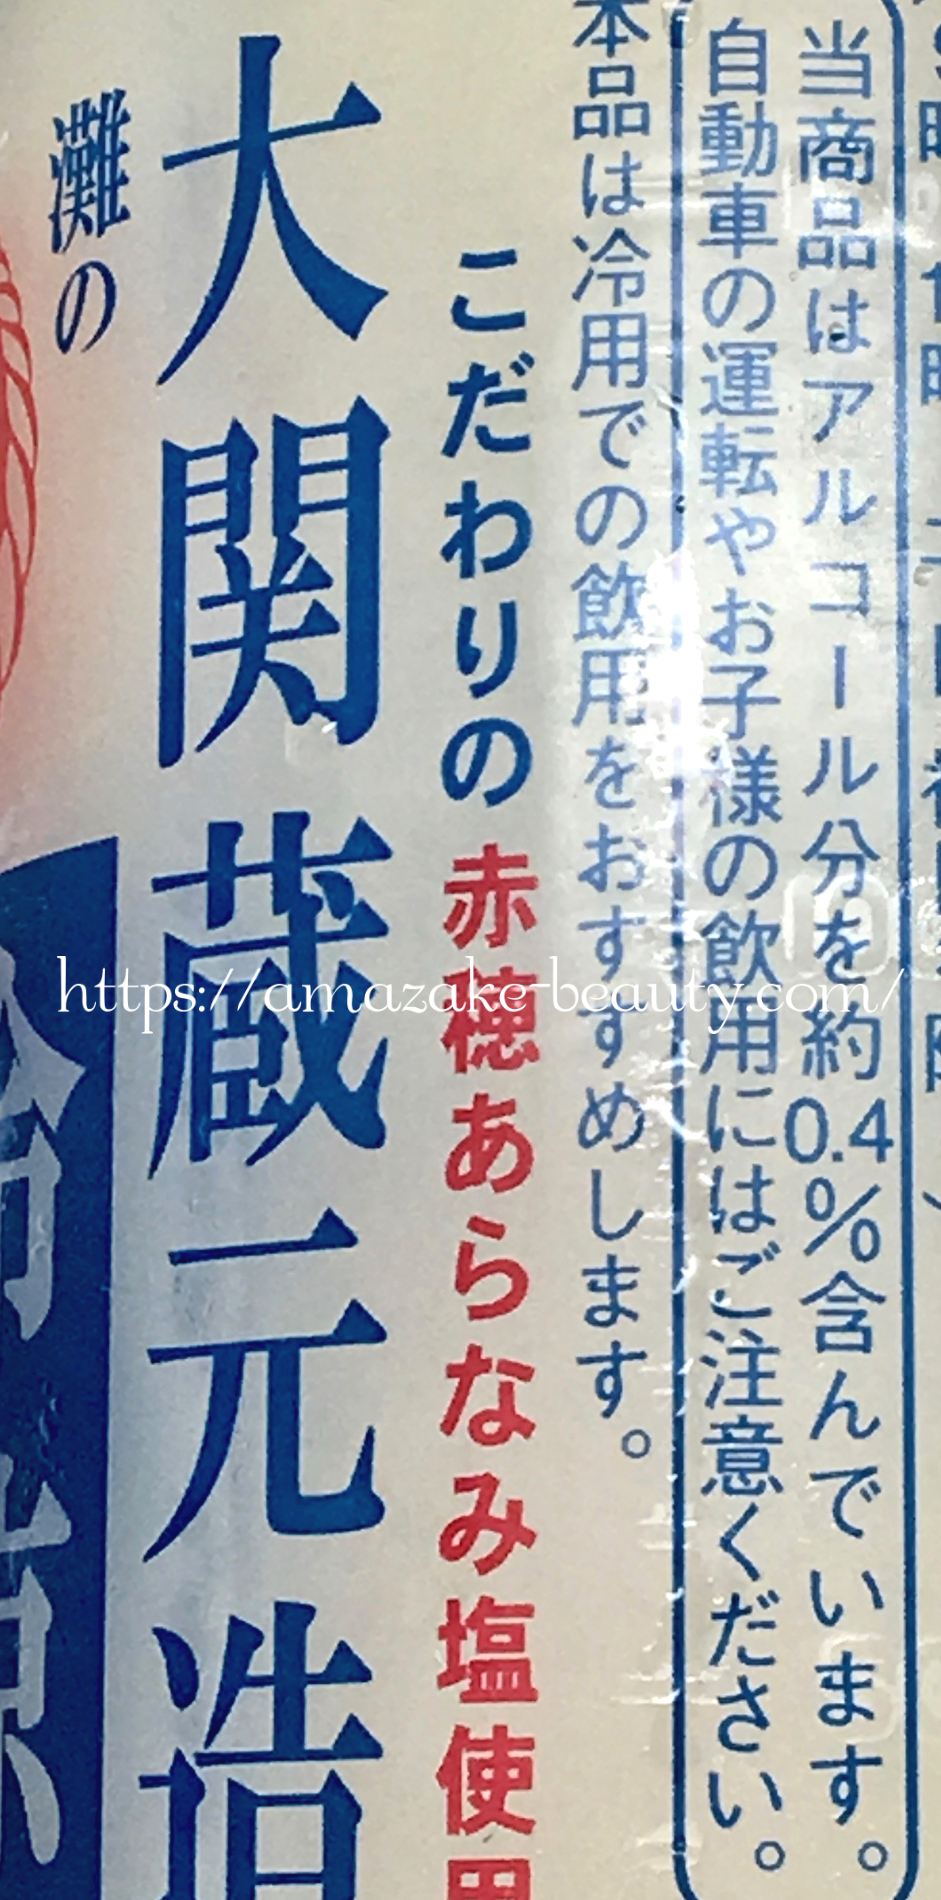 [amazake]ozeki[reiryo amazake](description)